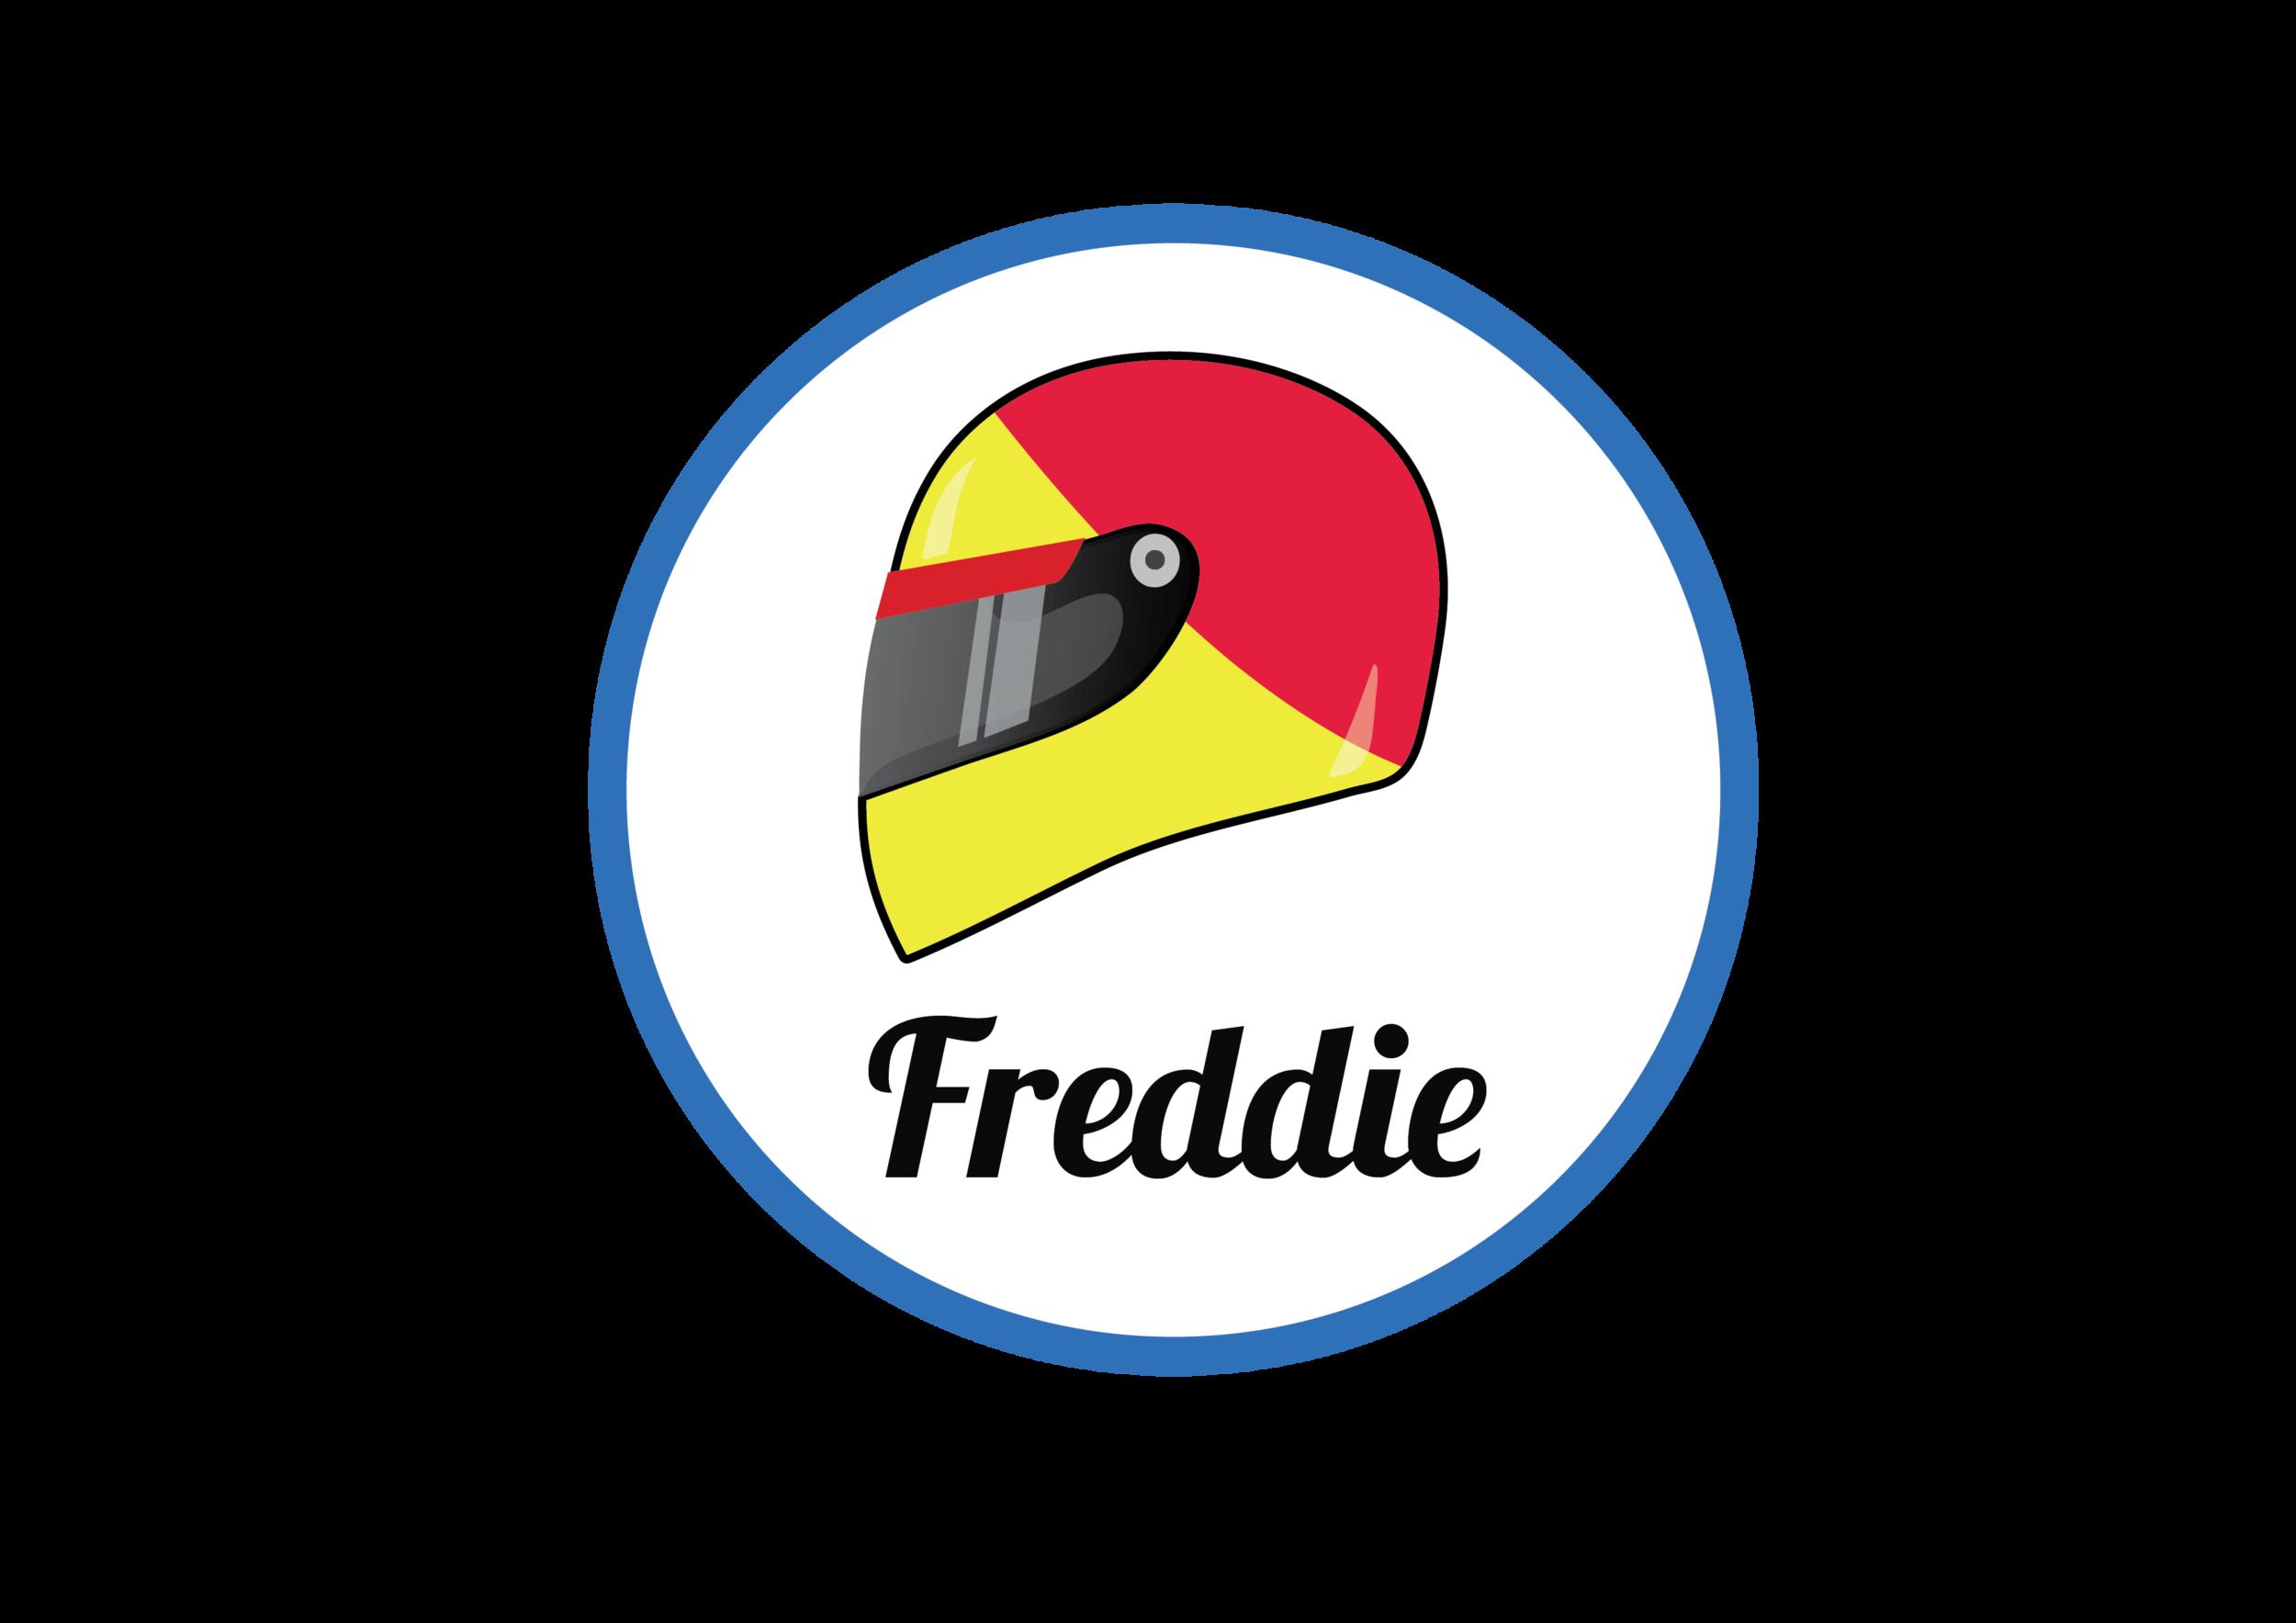 freddie logo-01.png